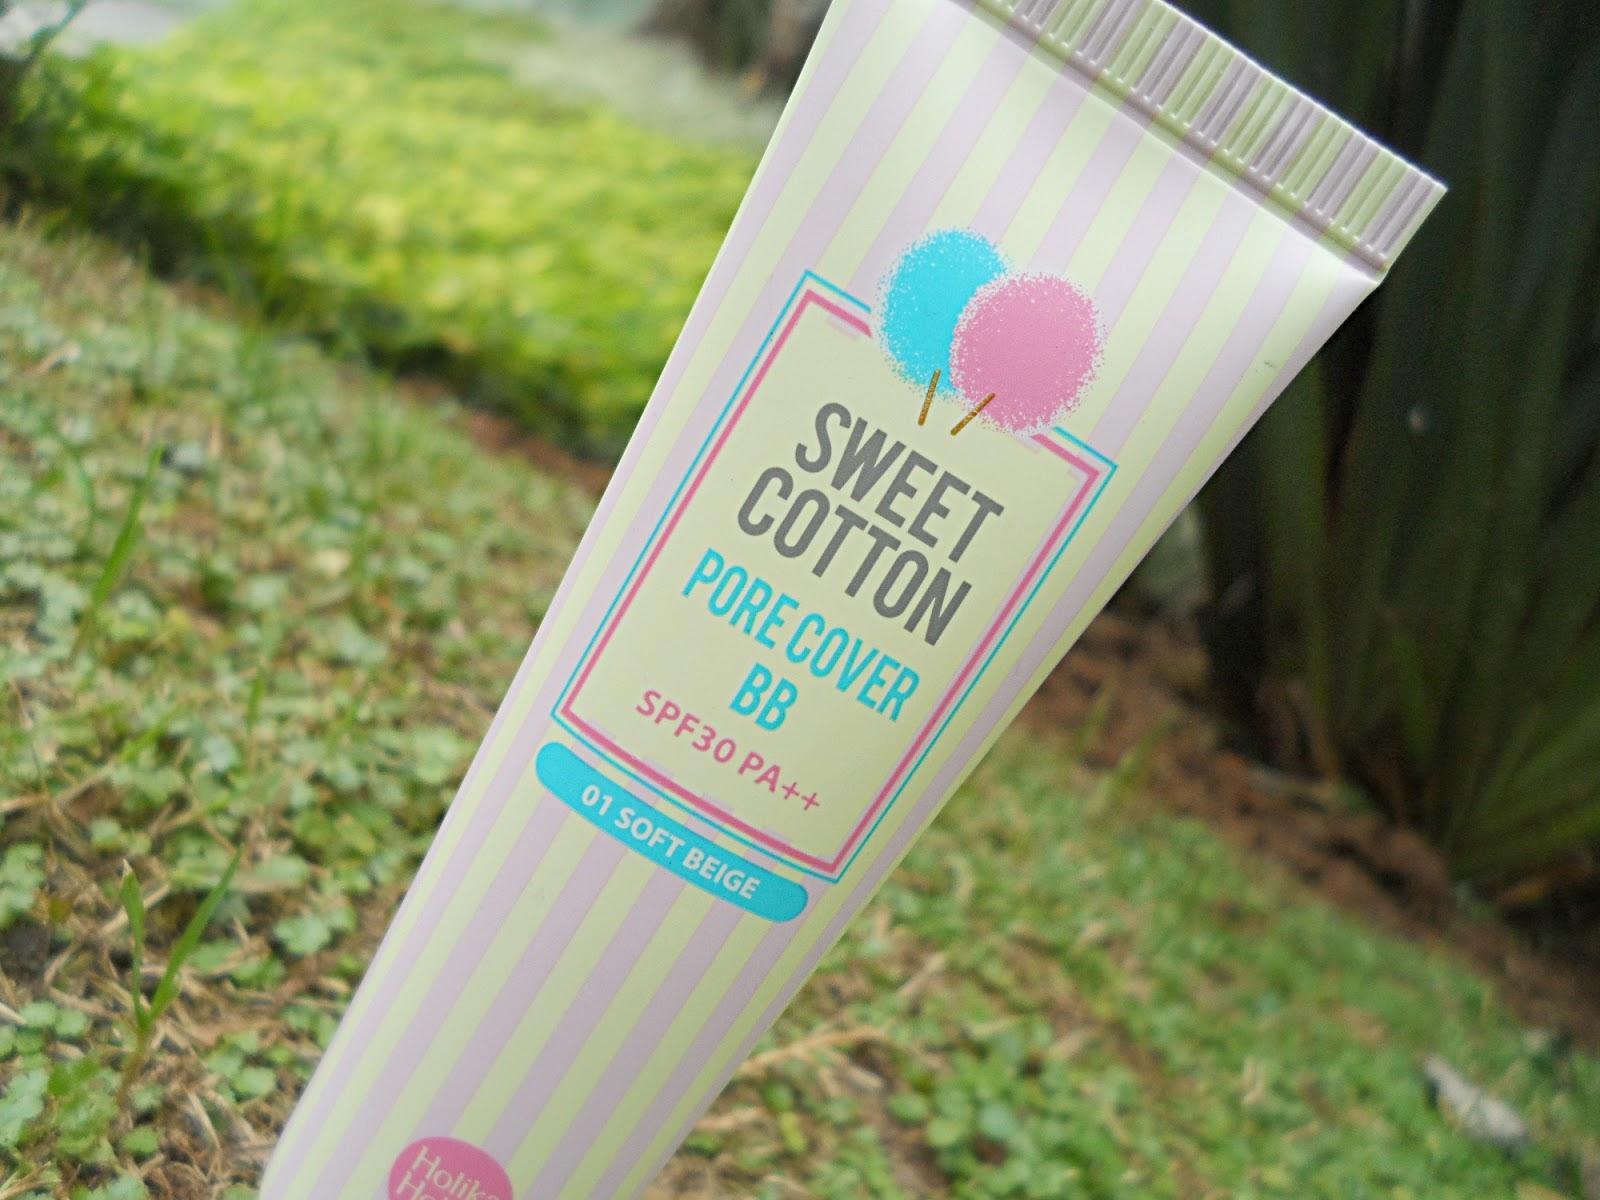 bb cream holika holika review blogger swatches liz breygel january girl korean makeup w2beauty store pore covering pore erazer